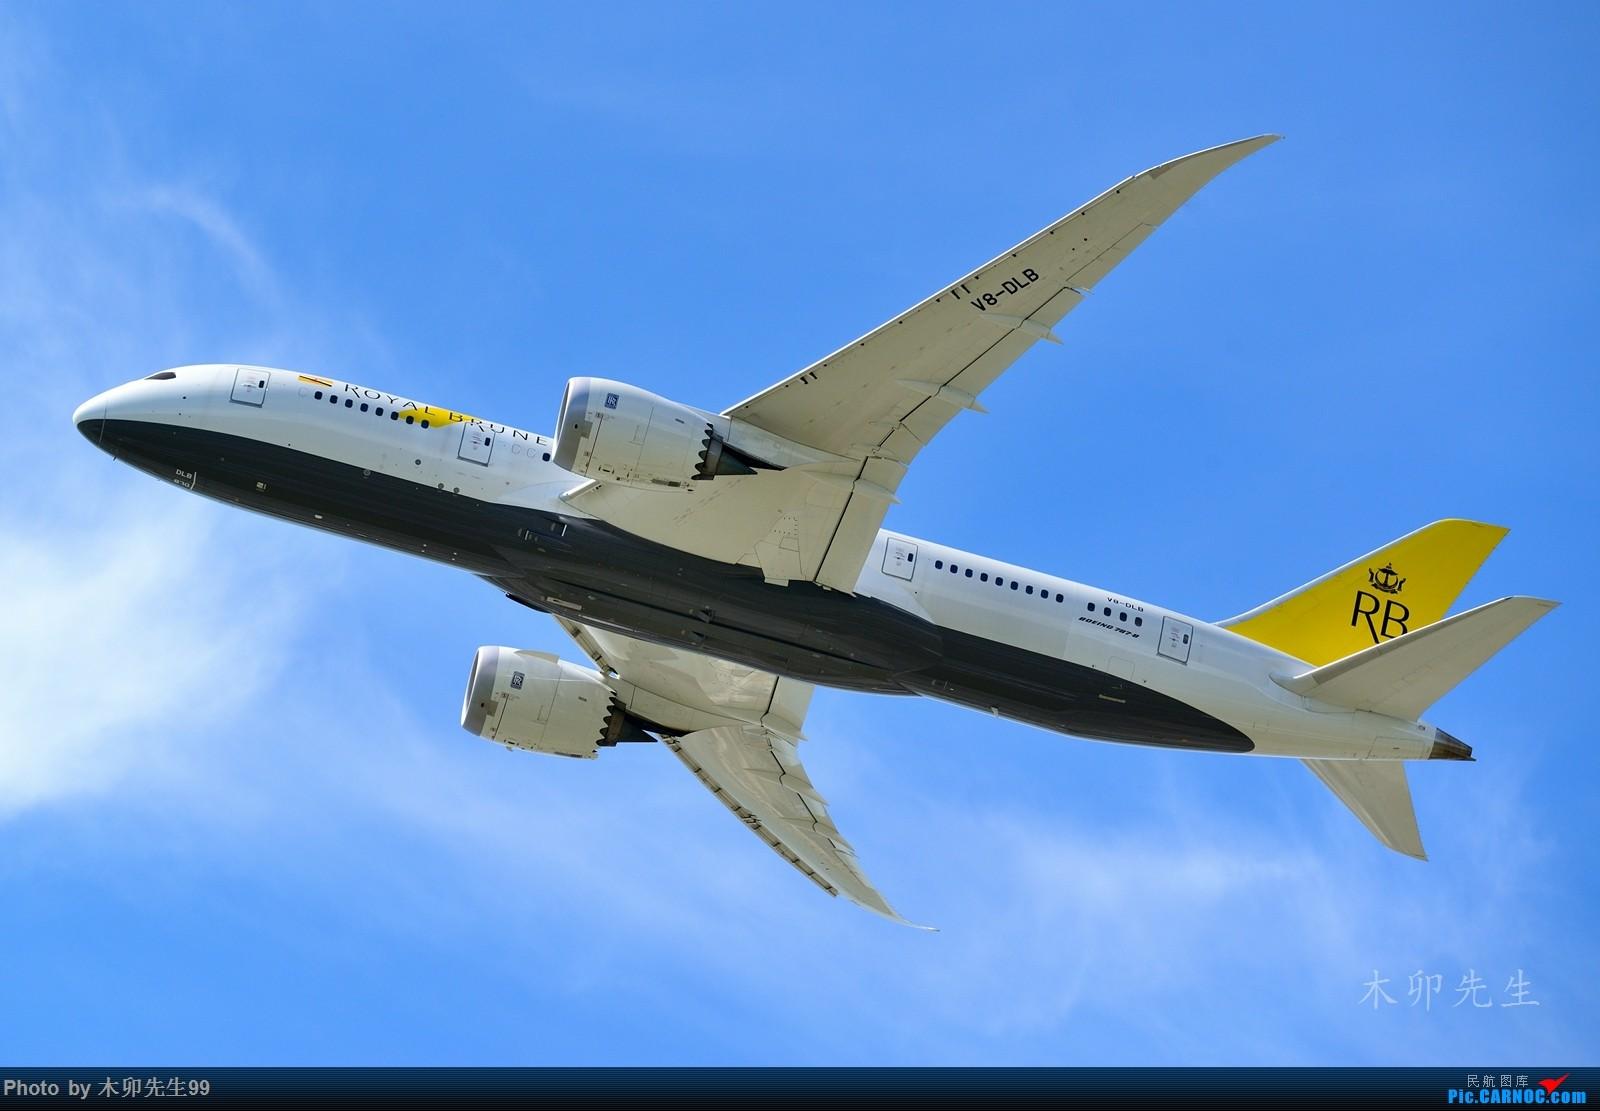 Re:[原创]【木卯先生99】—【2016年香港拍机新发现】—2016(不断添加) BOEING 787-8 V8-DLB 香港赤鱲角国际机场